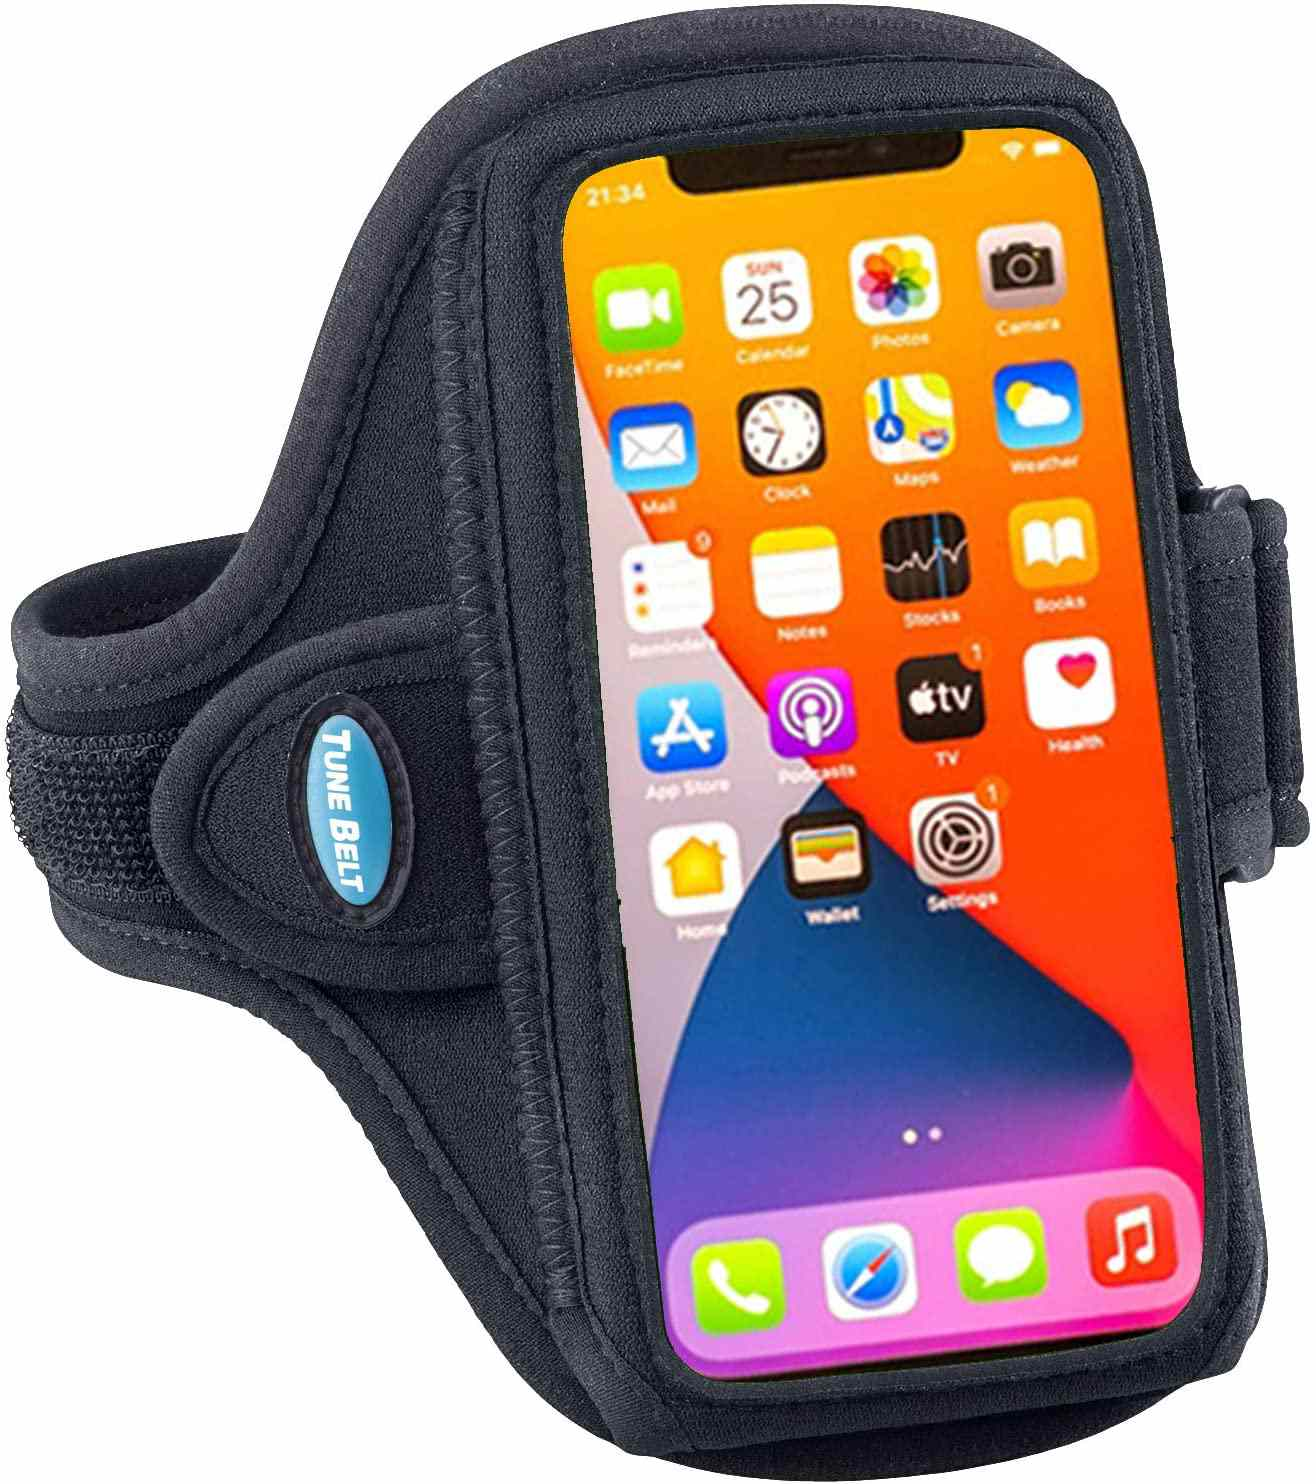 Tune Belt AB91 Cell Phone Armband